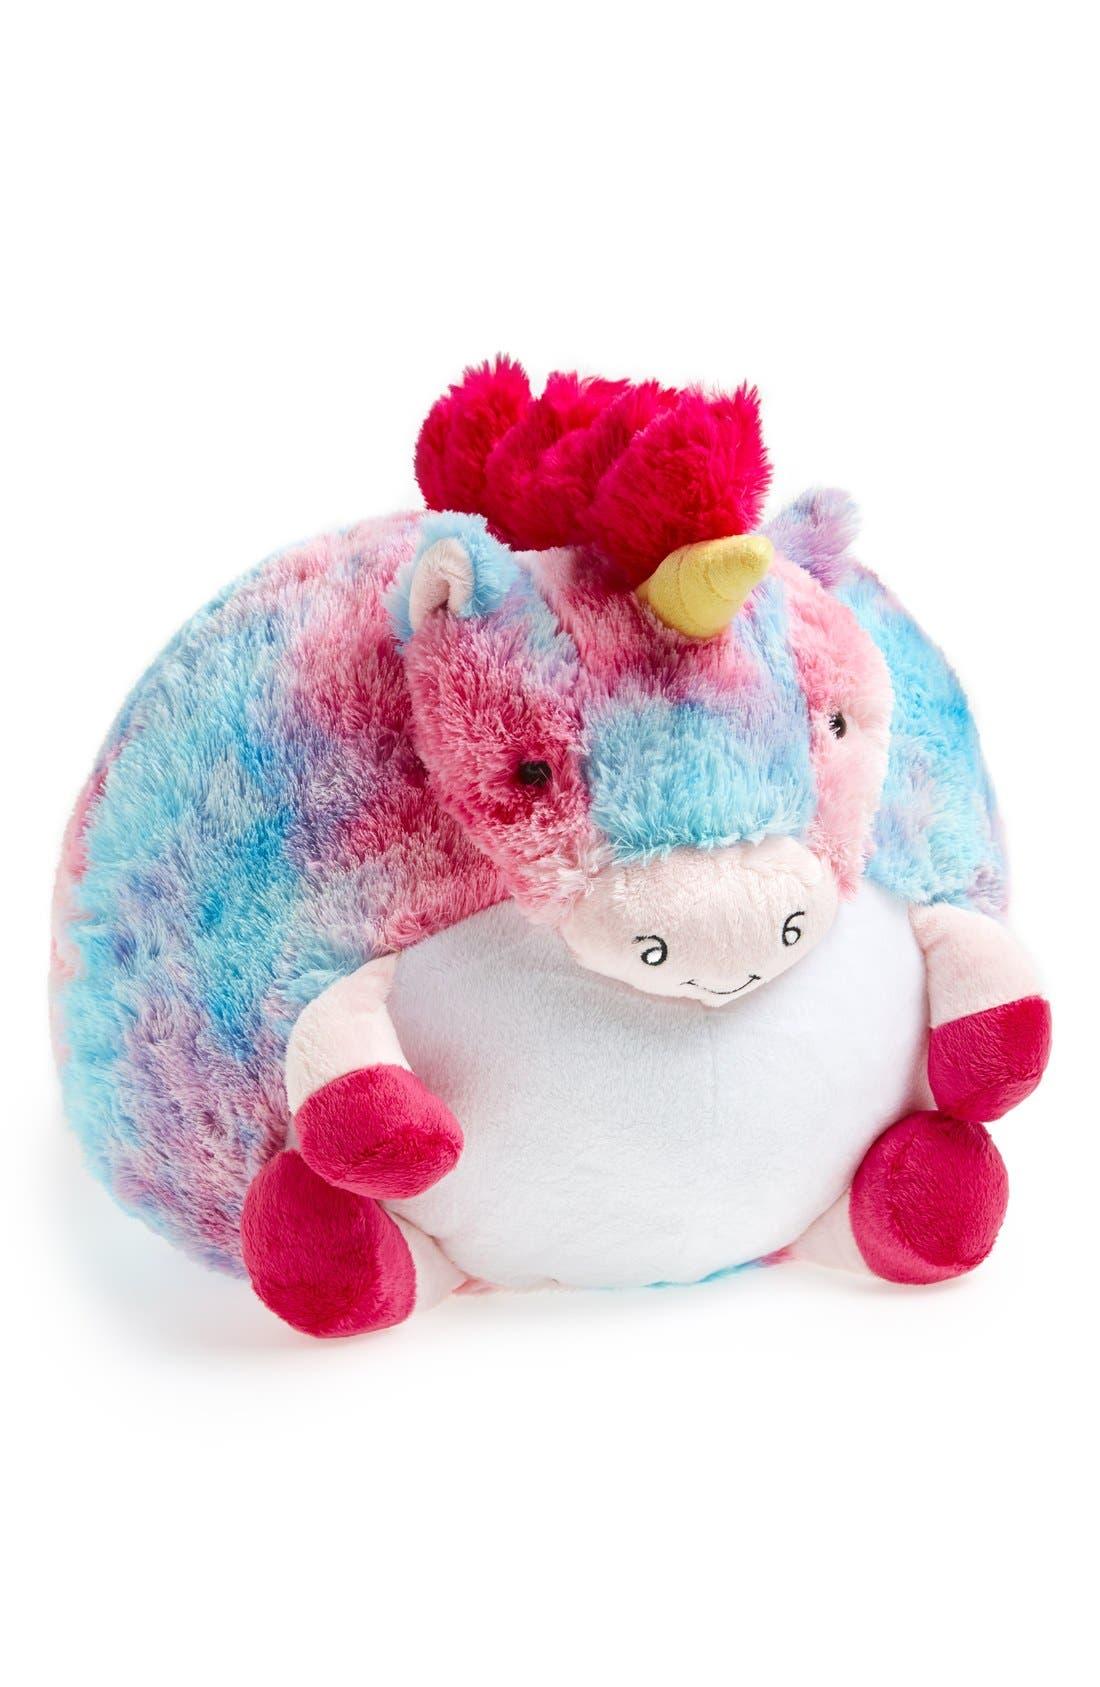 Alternate Image 3  - Squishable 'Unicorn - Prism' Plush Stuffed Animal